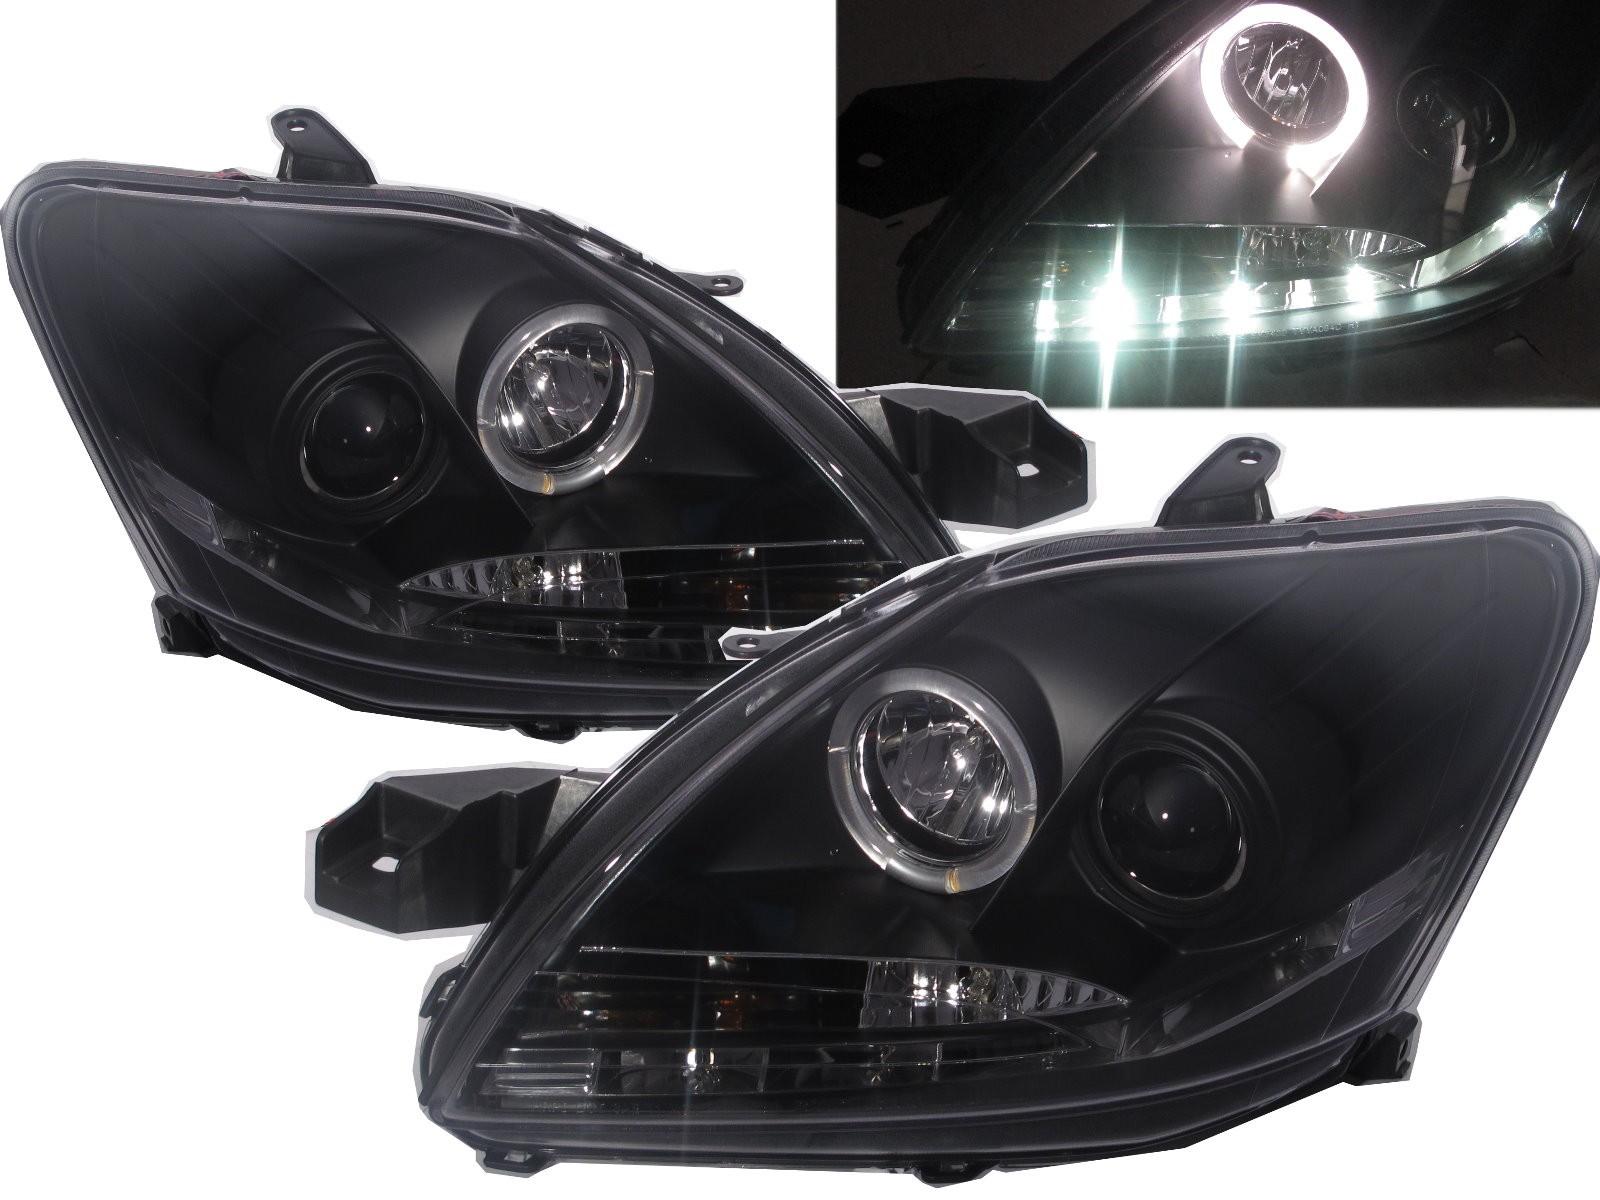 CrazyTheGod Belta XP90 Second generation 2009-2013 FACELIFT Sedan 4D Angel-Eye Projector R8Look Headlight Headlamp Black V1 for TOYOTA LHD